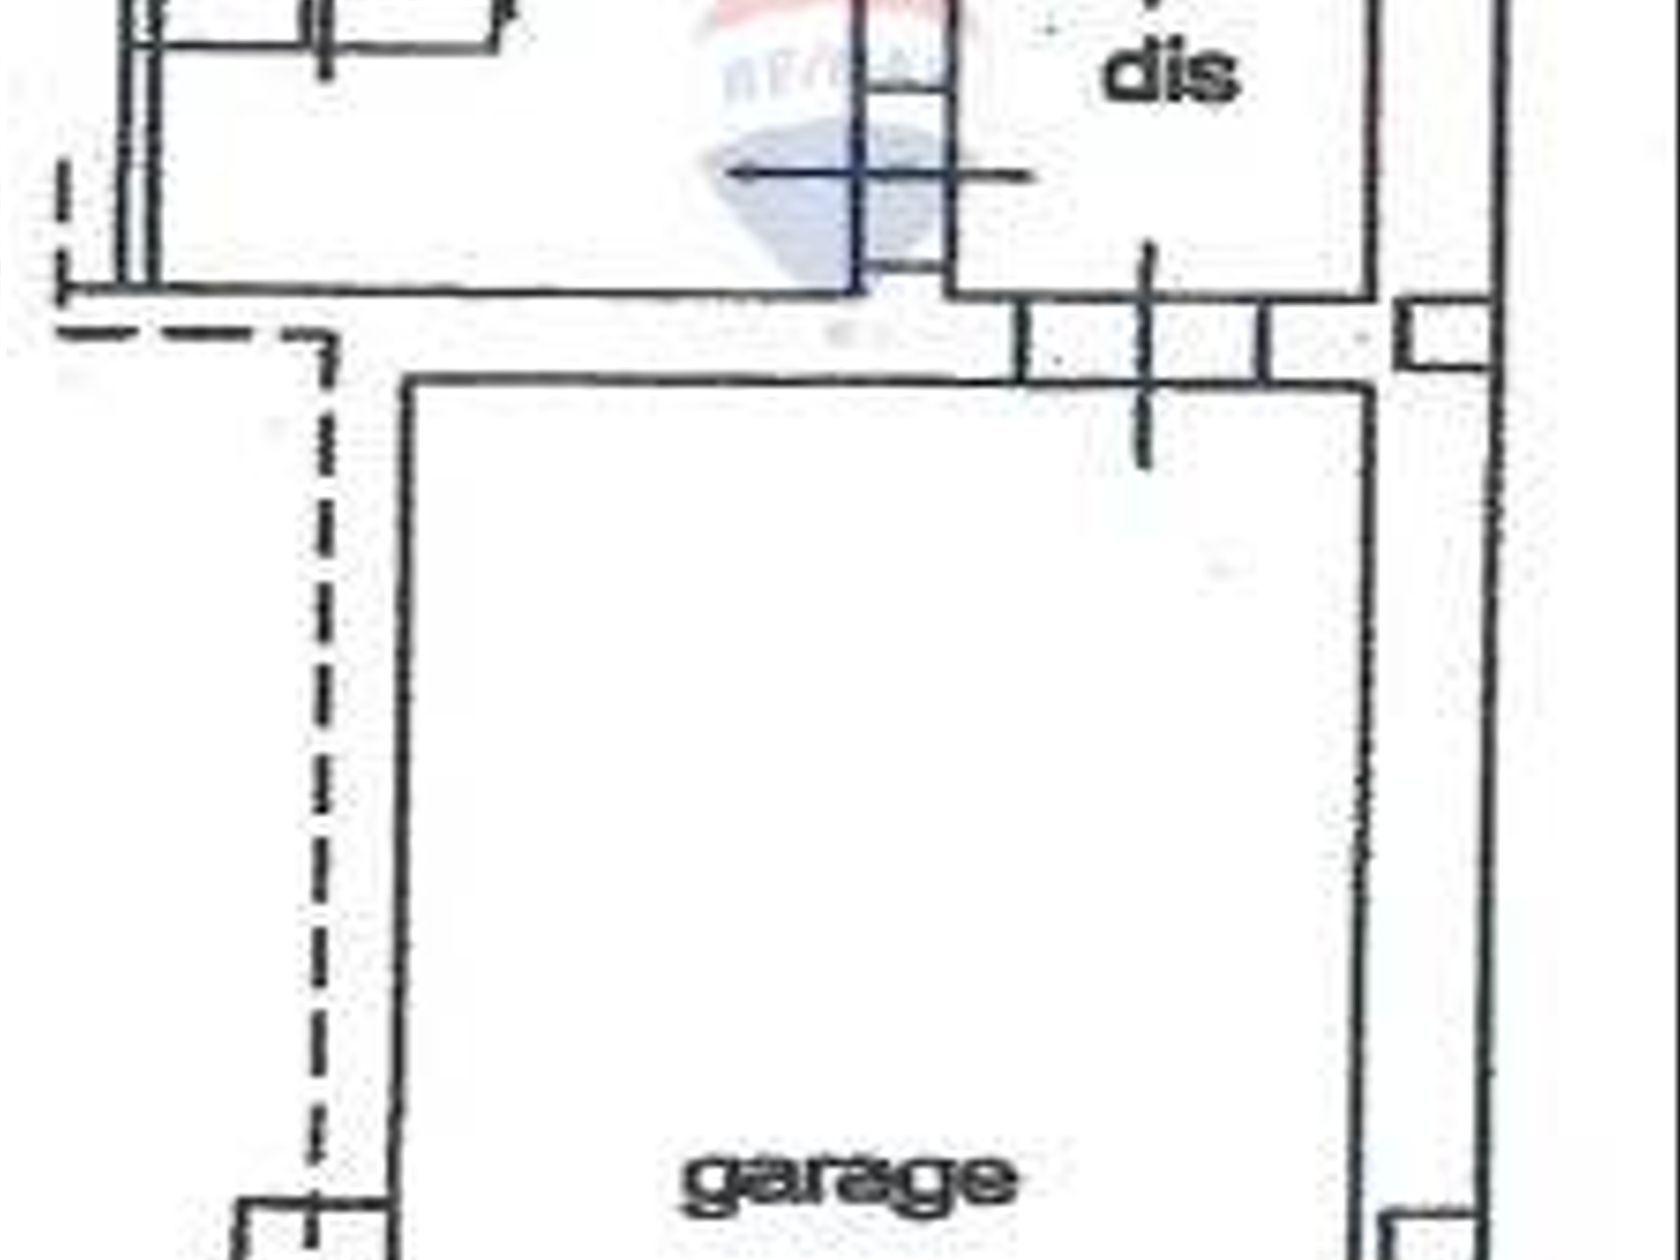 Villa singola Spigno Saturnia, LT Vendita - Planimetria 2